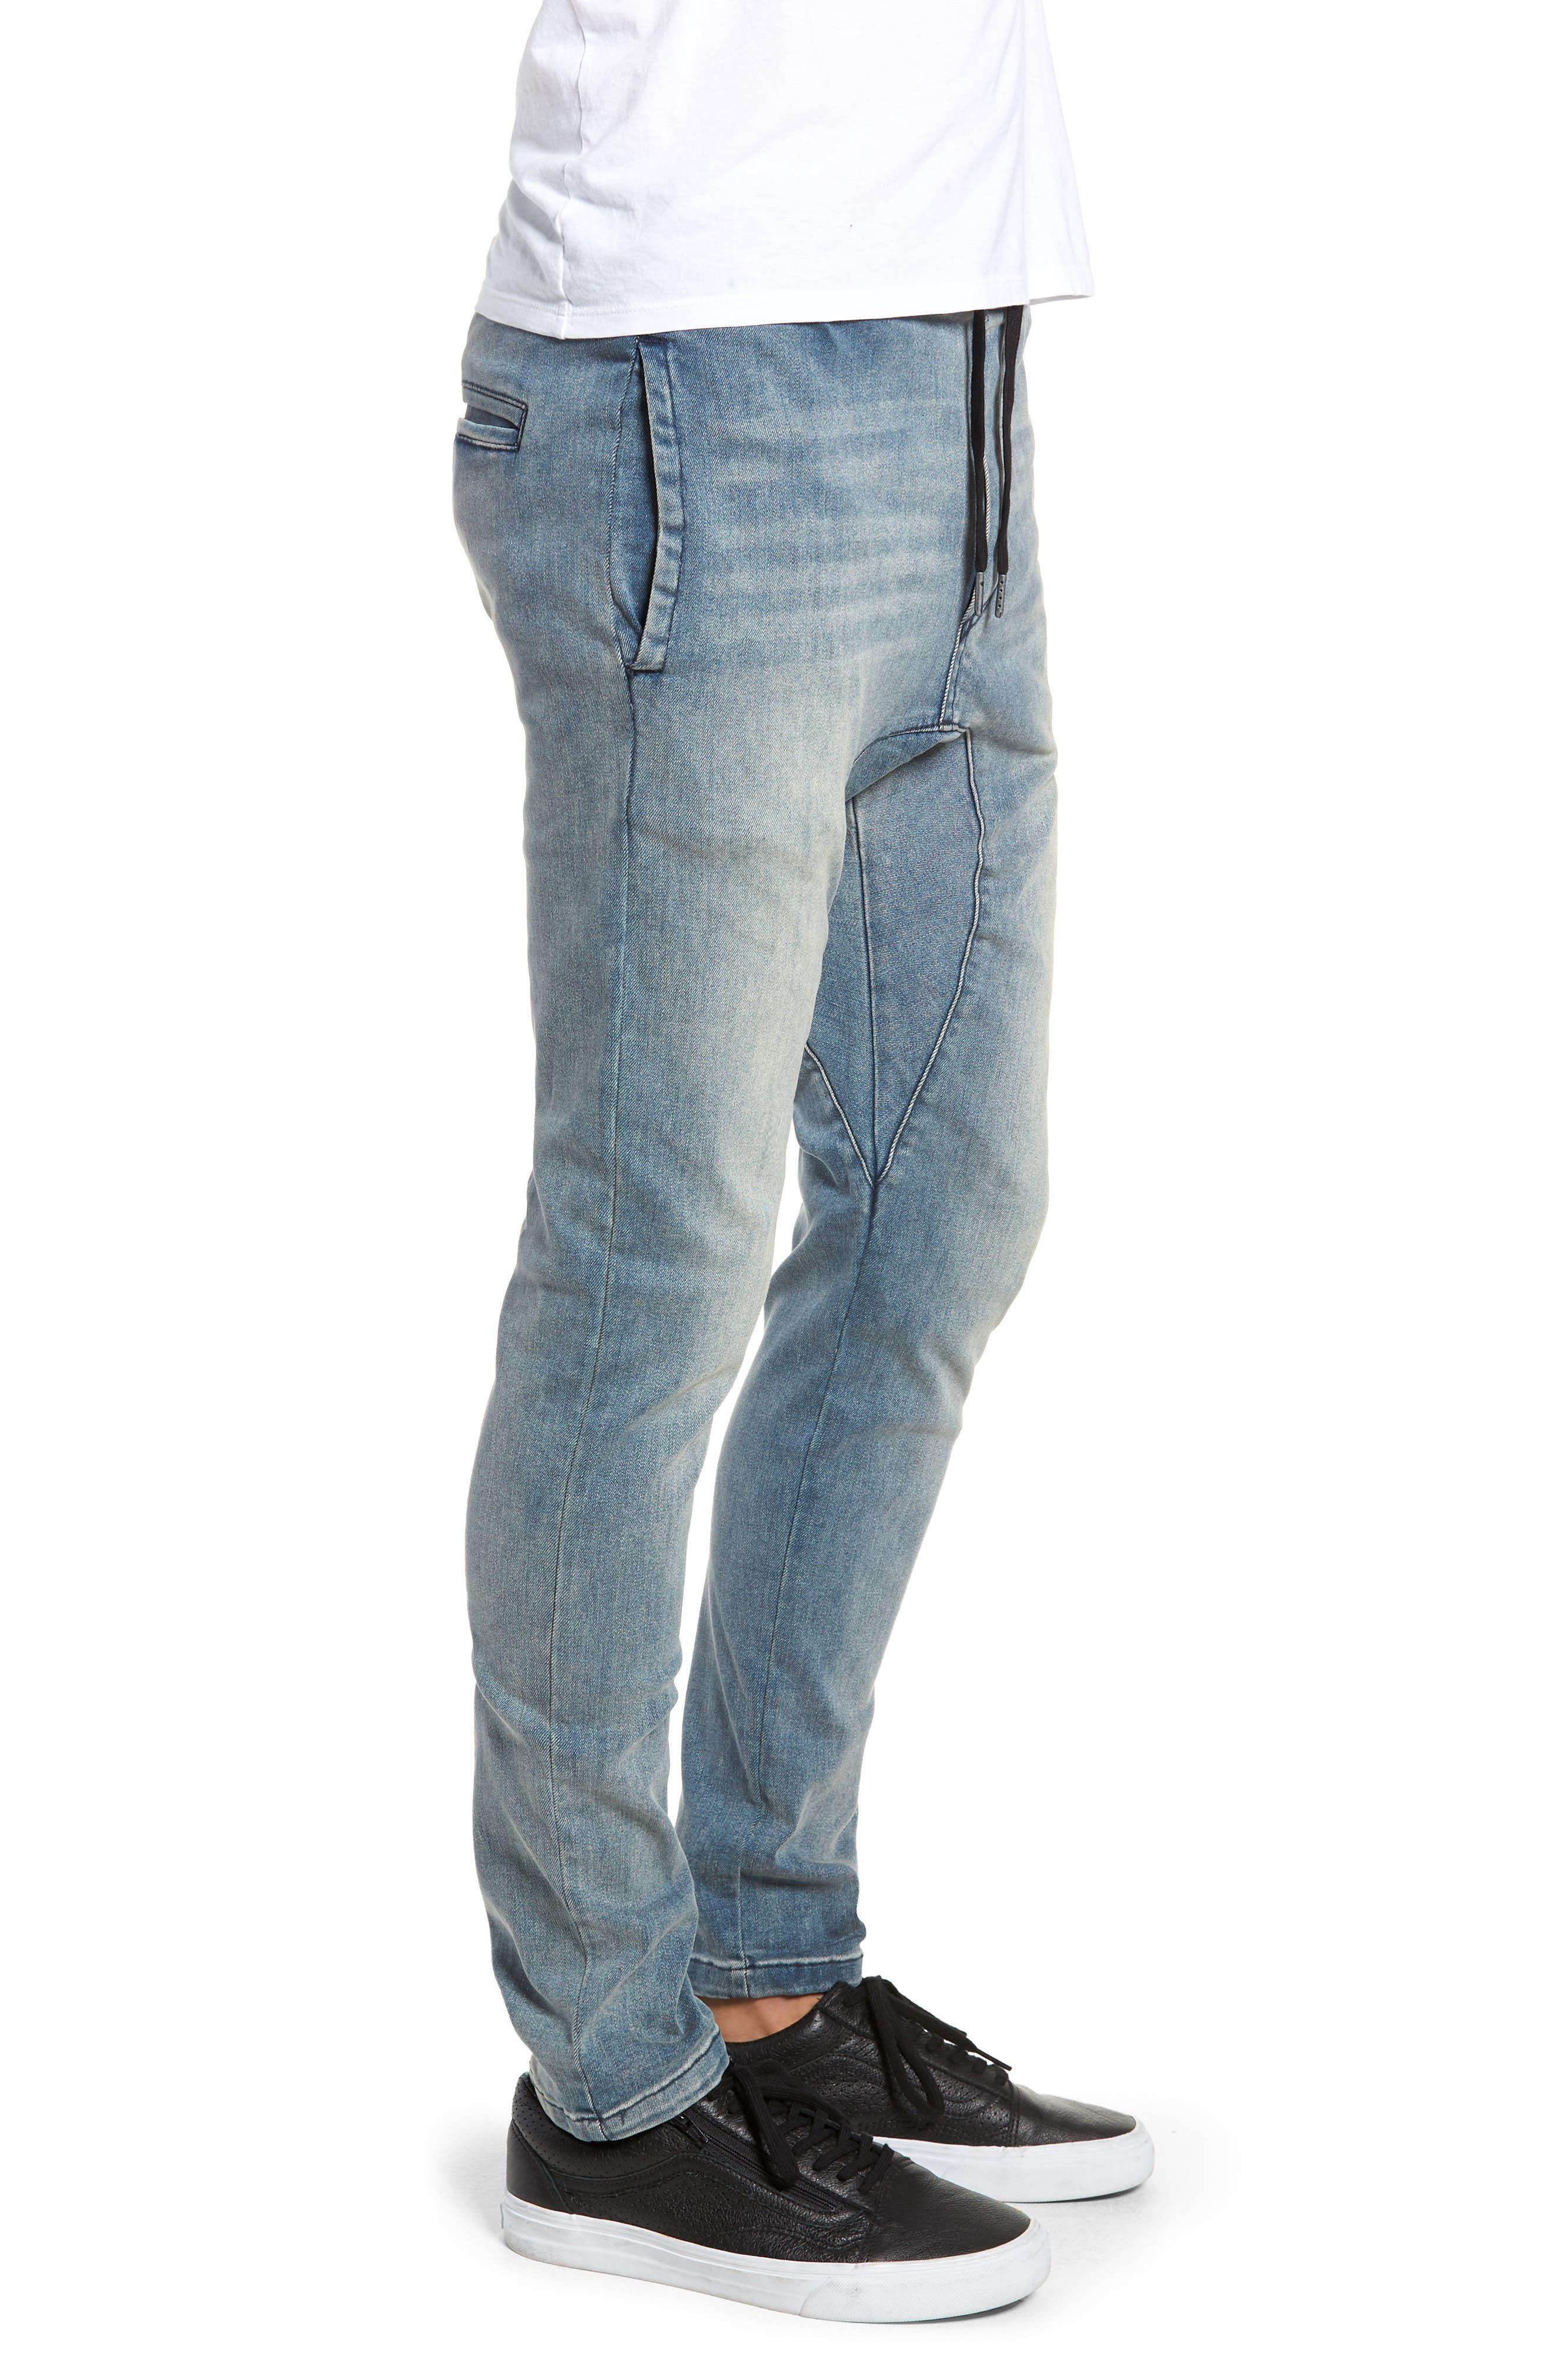 Salerno Flex Jeans,                             Alternate thumbnail 3, color,                             ABANDONED BLUE